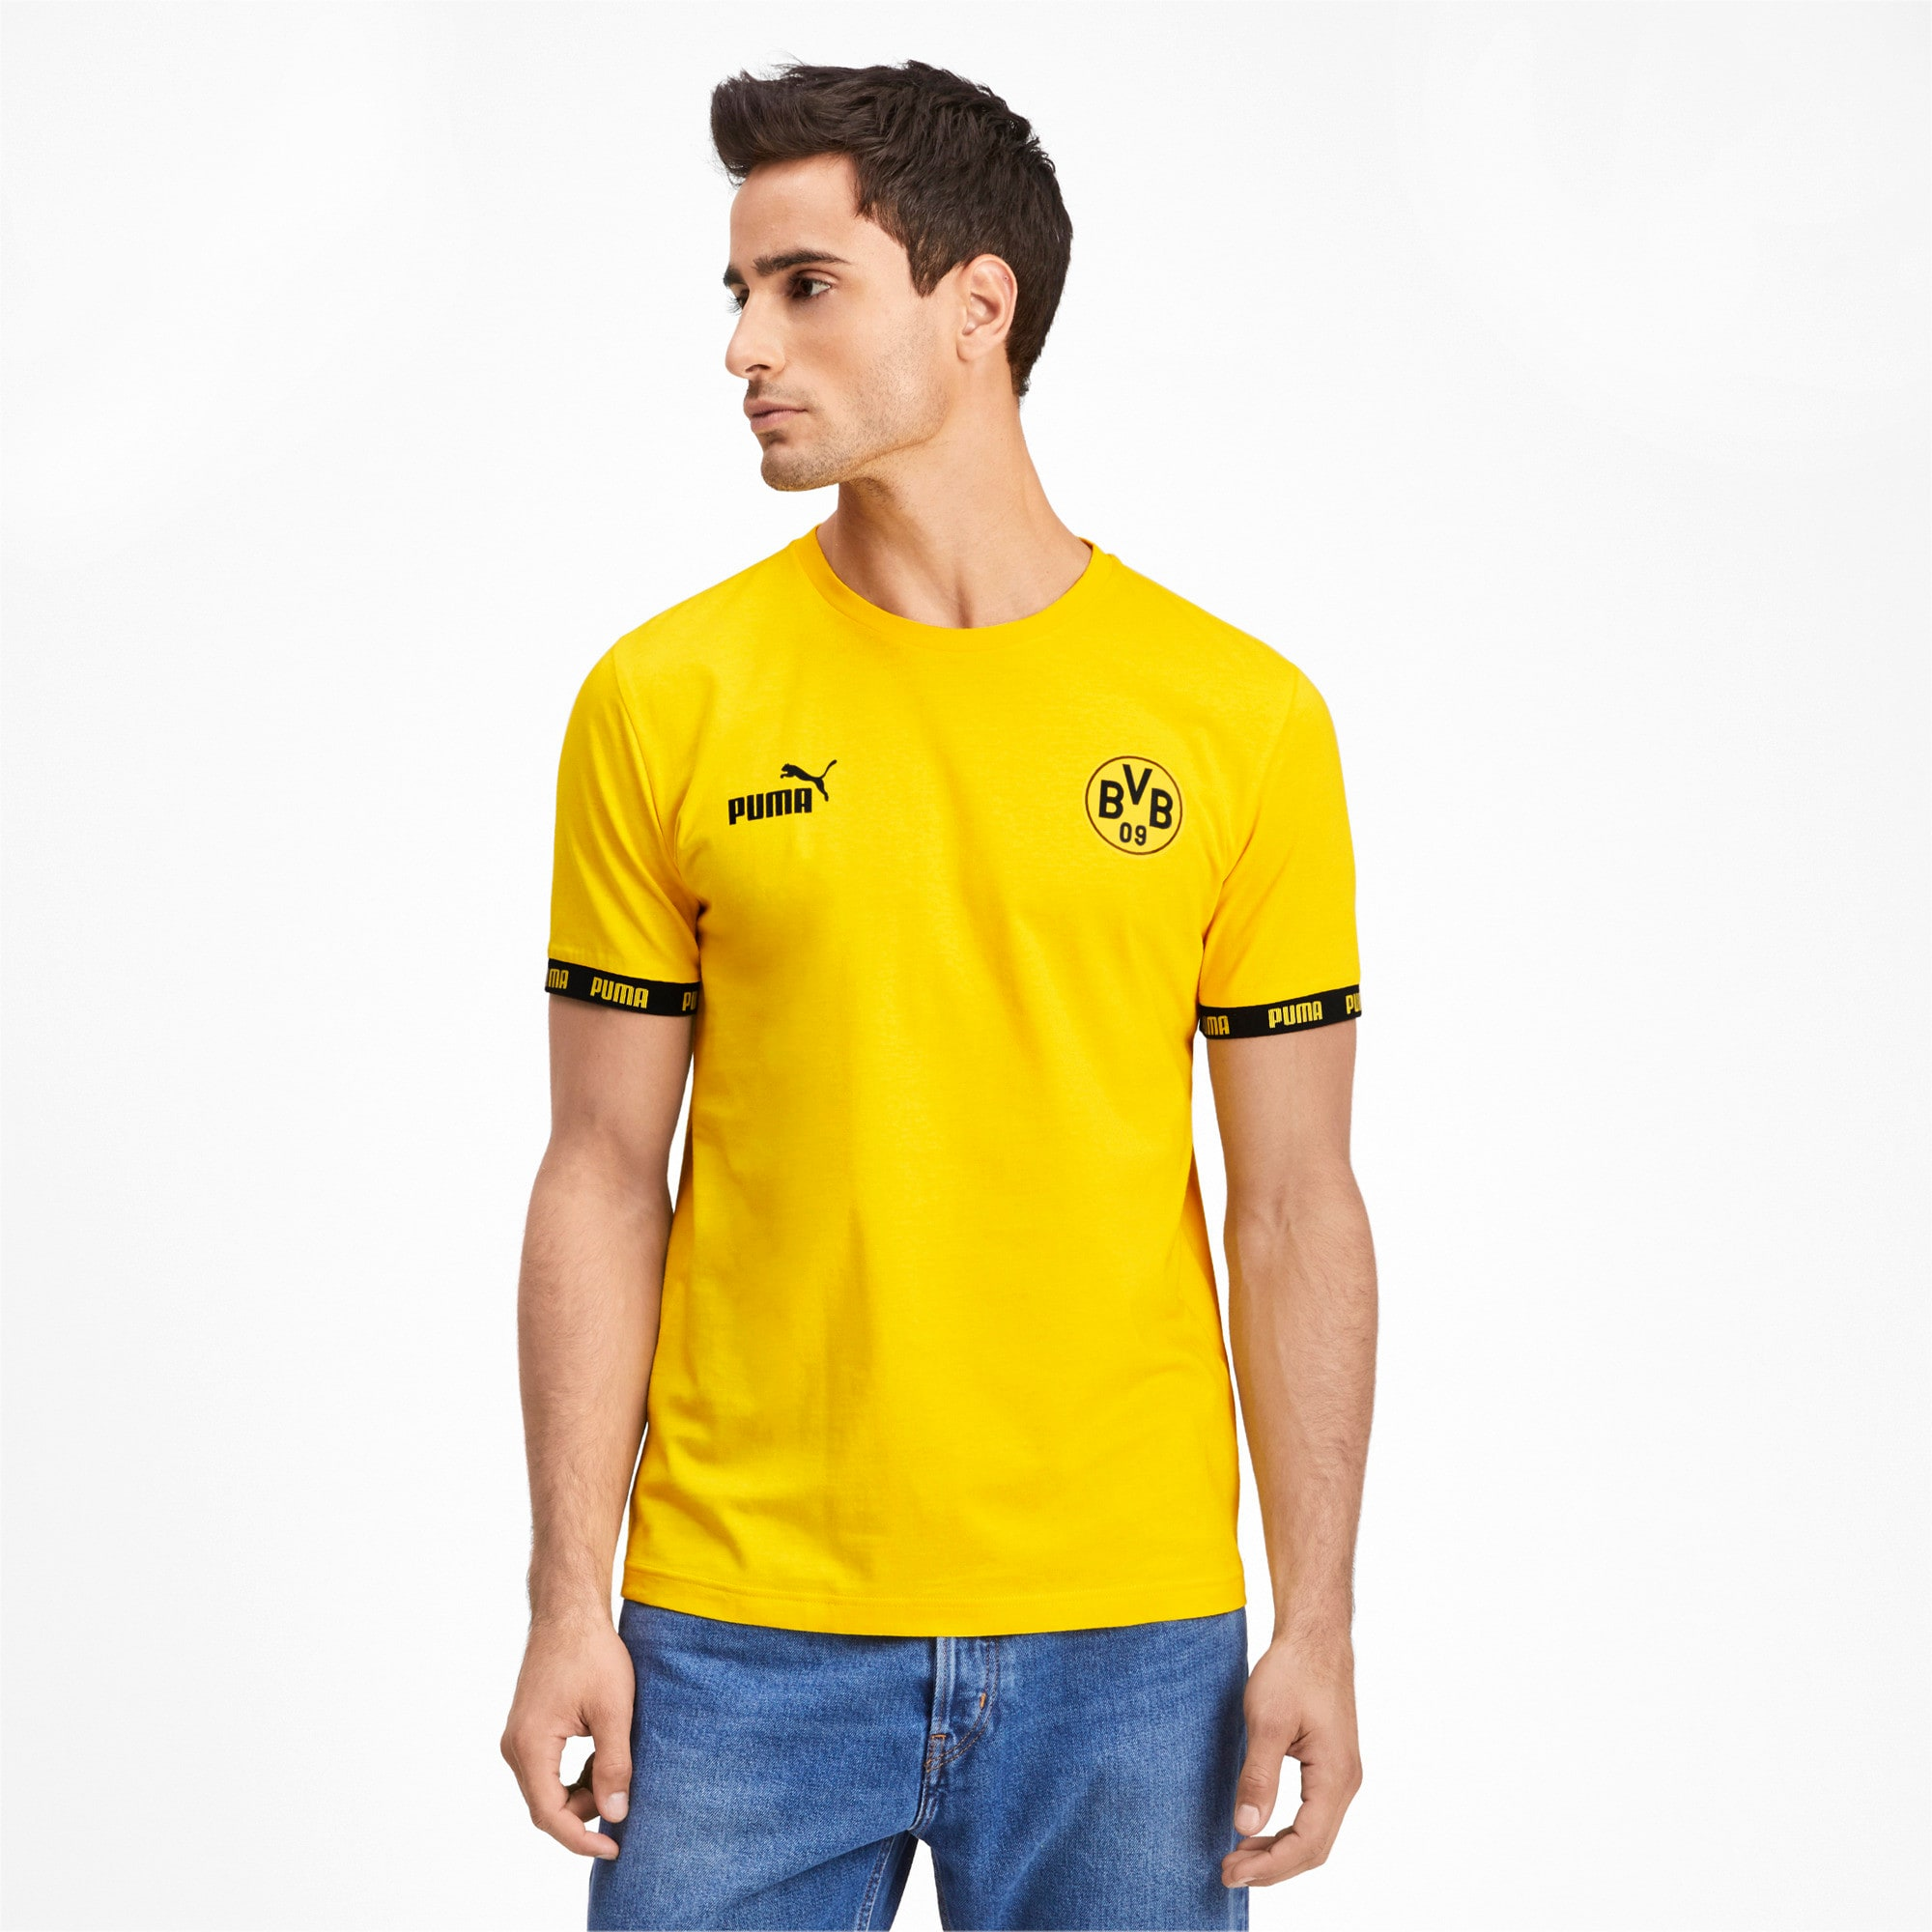 Thumbnail 1 of BVB Football Culture Men's Tee, Cyber Yellow, medium